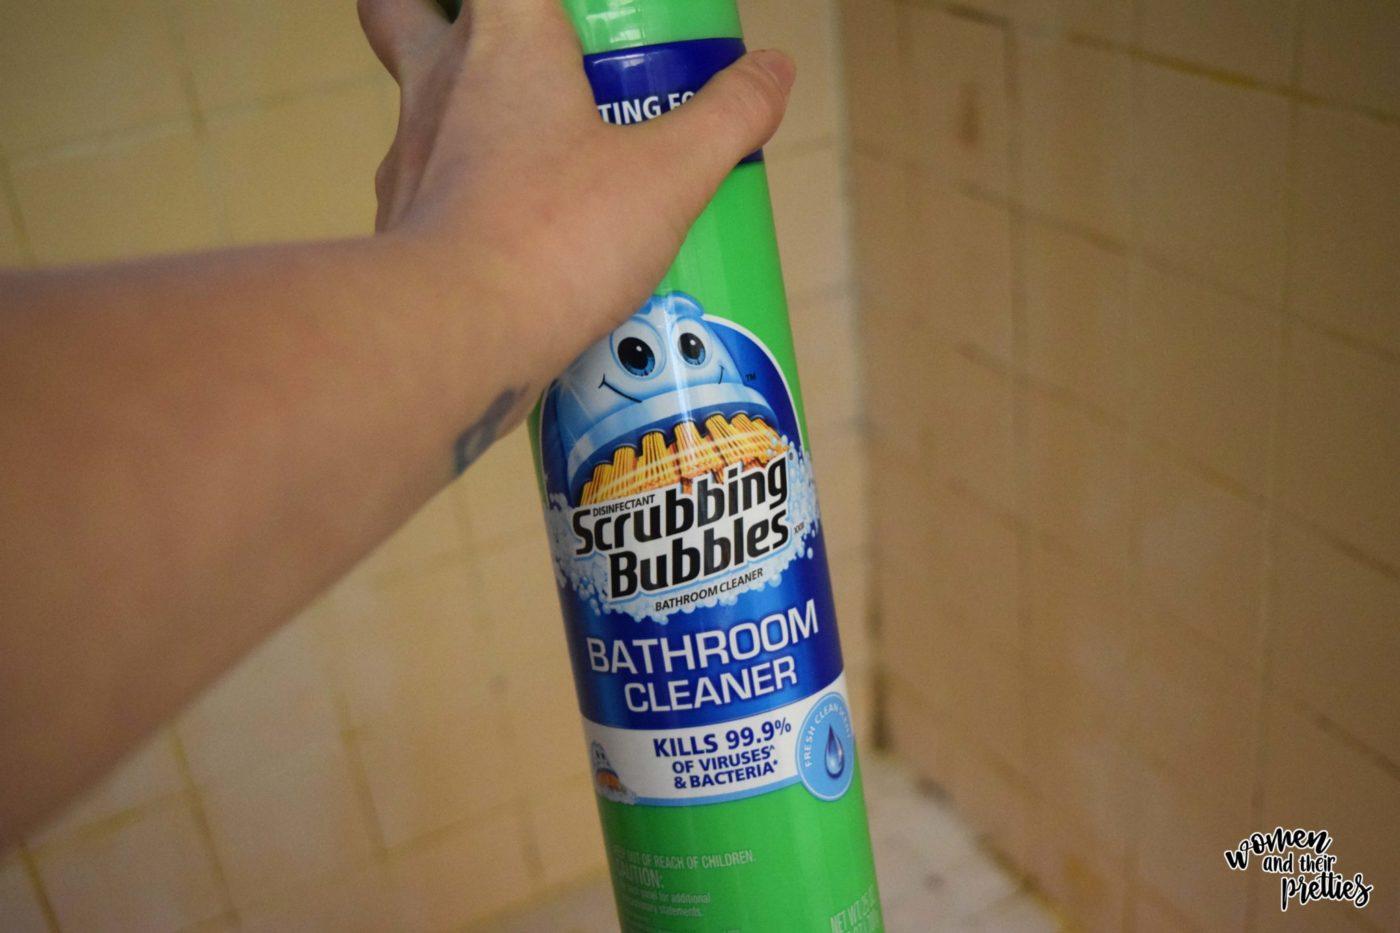 Spray Scrubbing Bubbles for April Showers